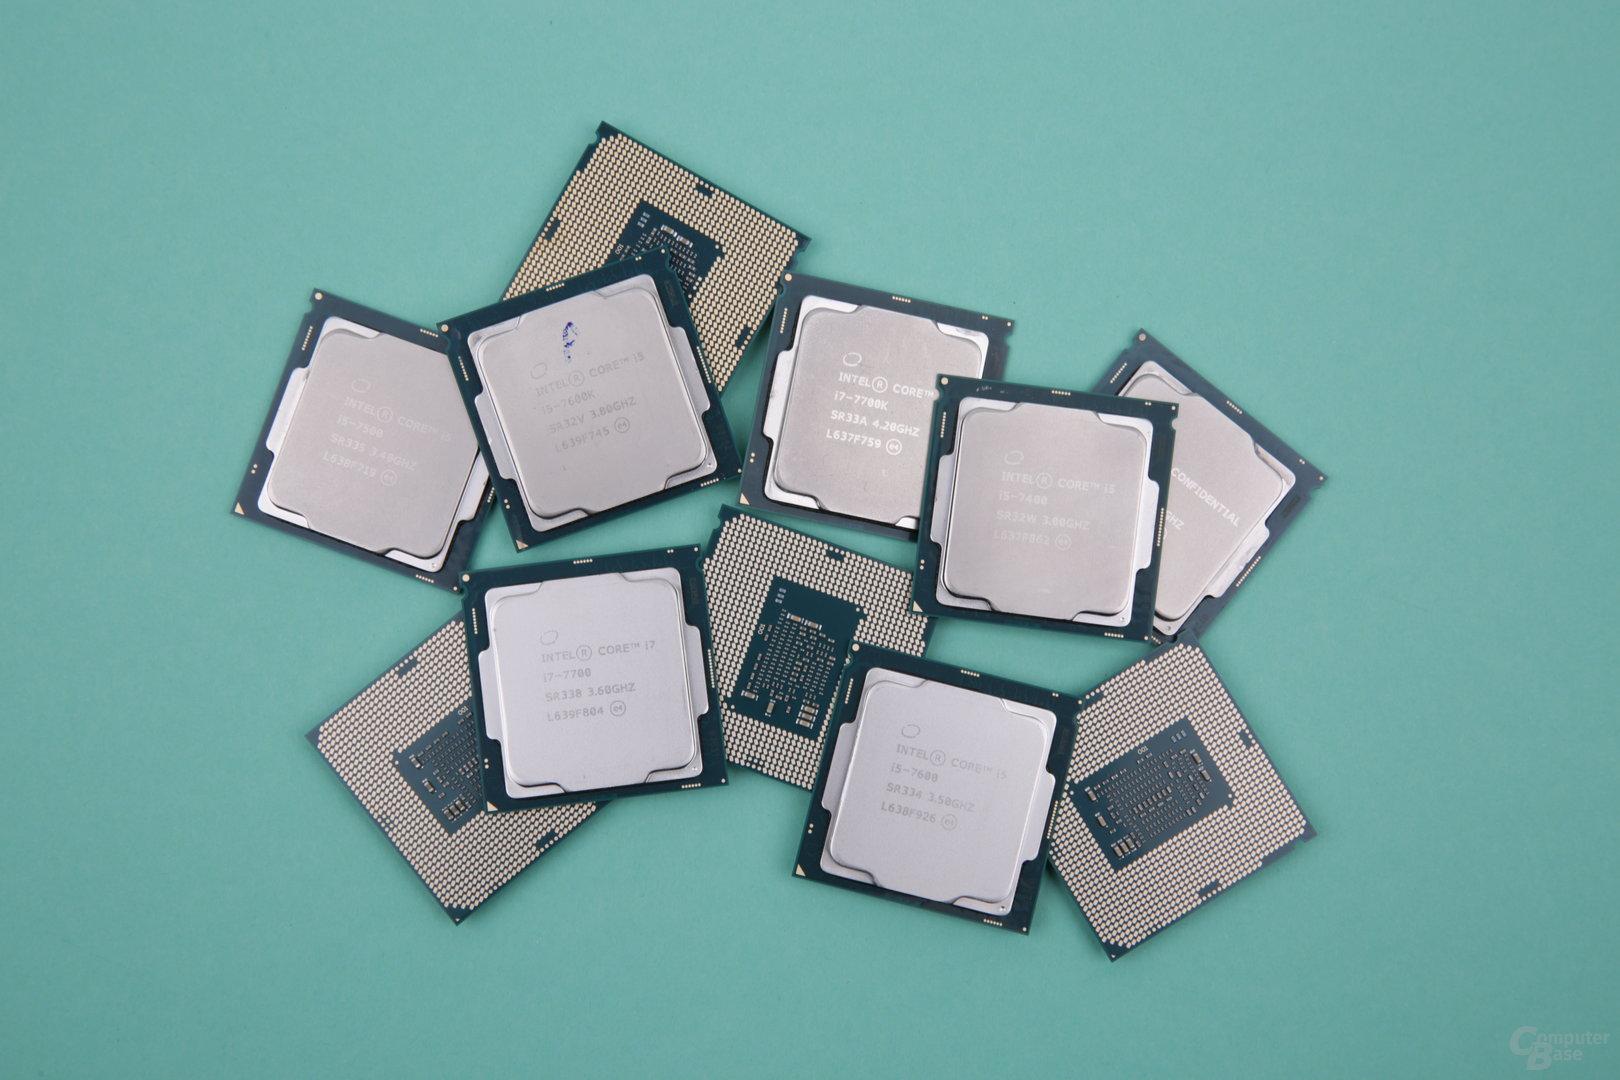 Intel Kaby Lake im Test: Core i7, i5, i3, Pentium und Celeron im Vergleich